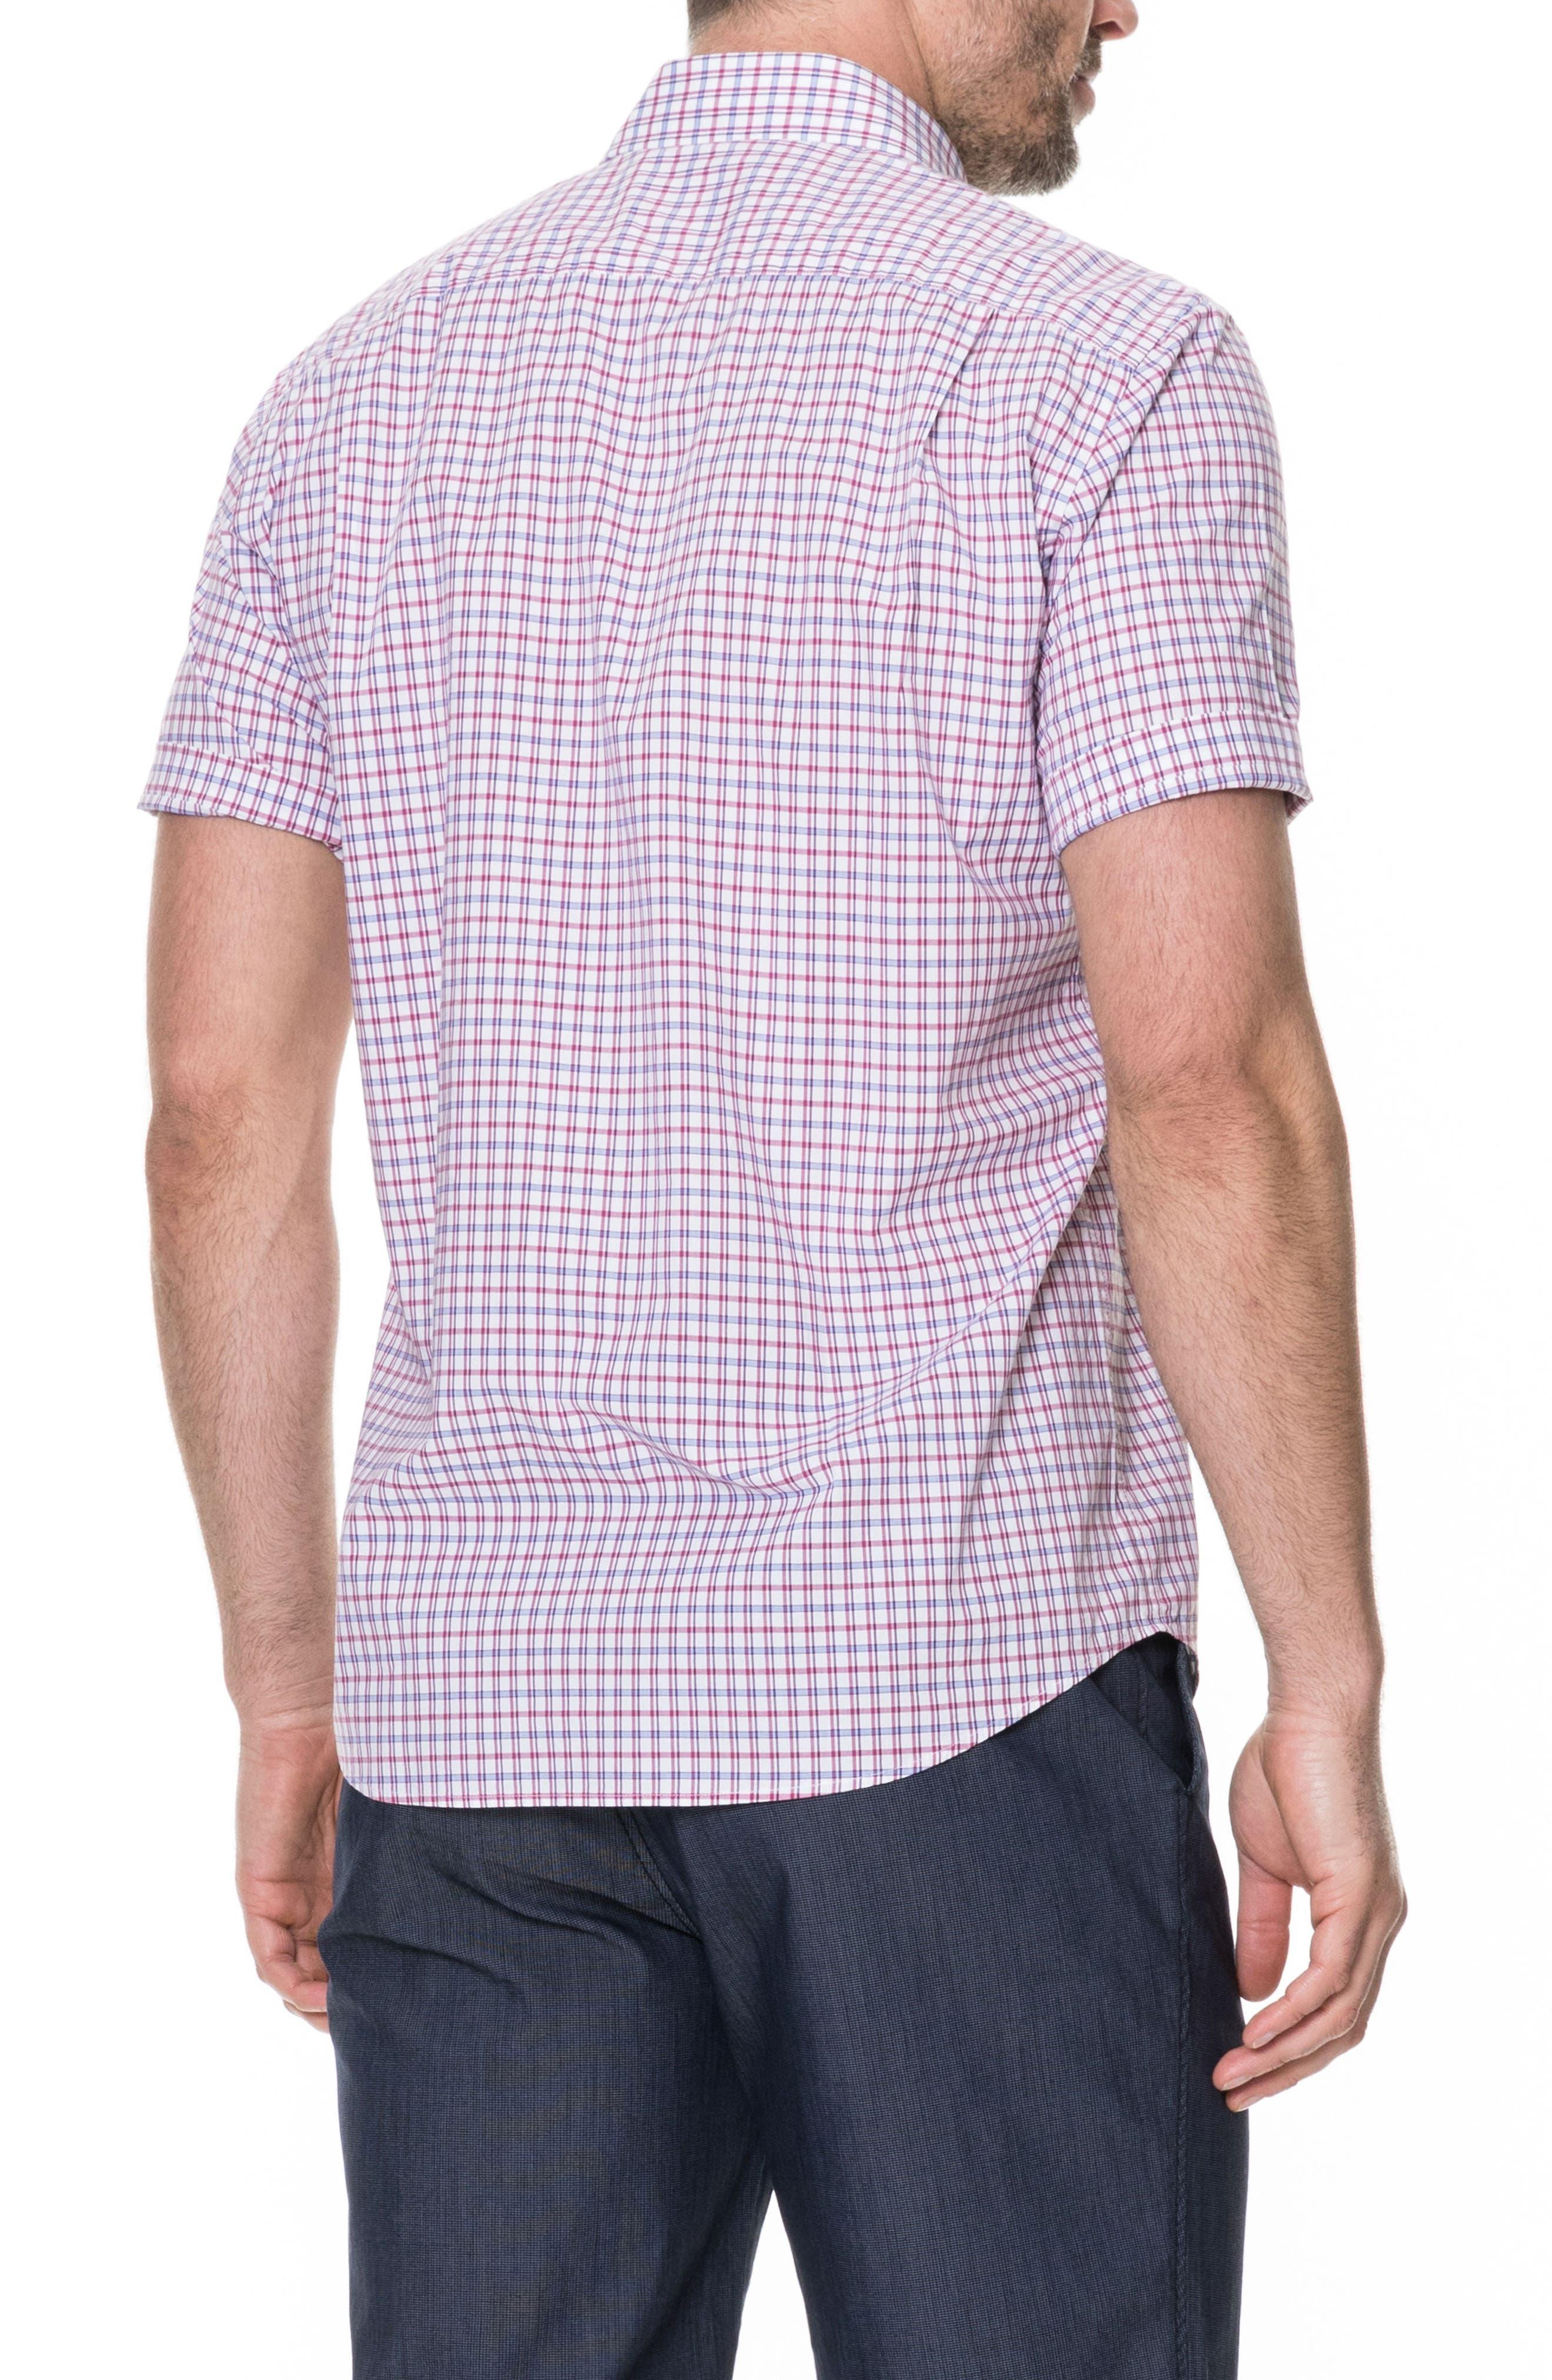 Waterford Regular Fit Sport Shirt,                             Alternate thumbnail 2, color,                             510